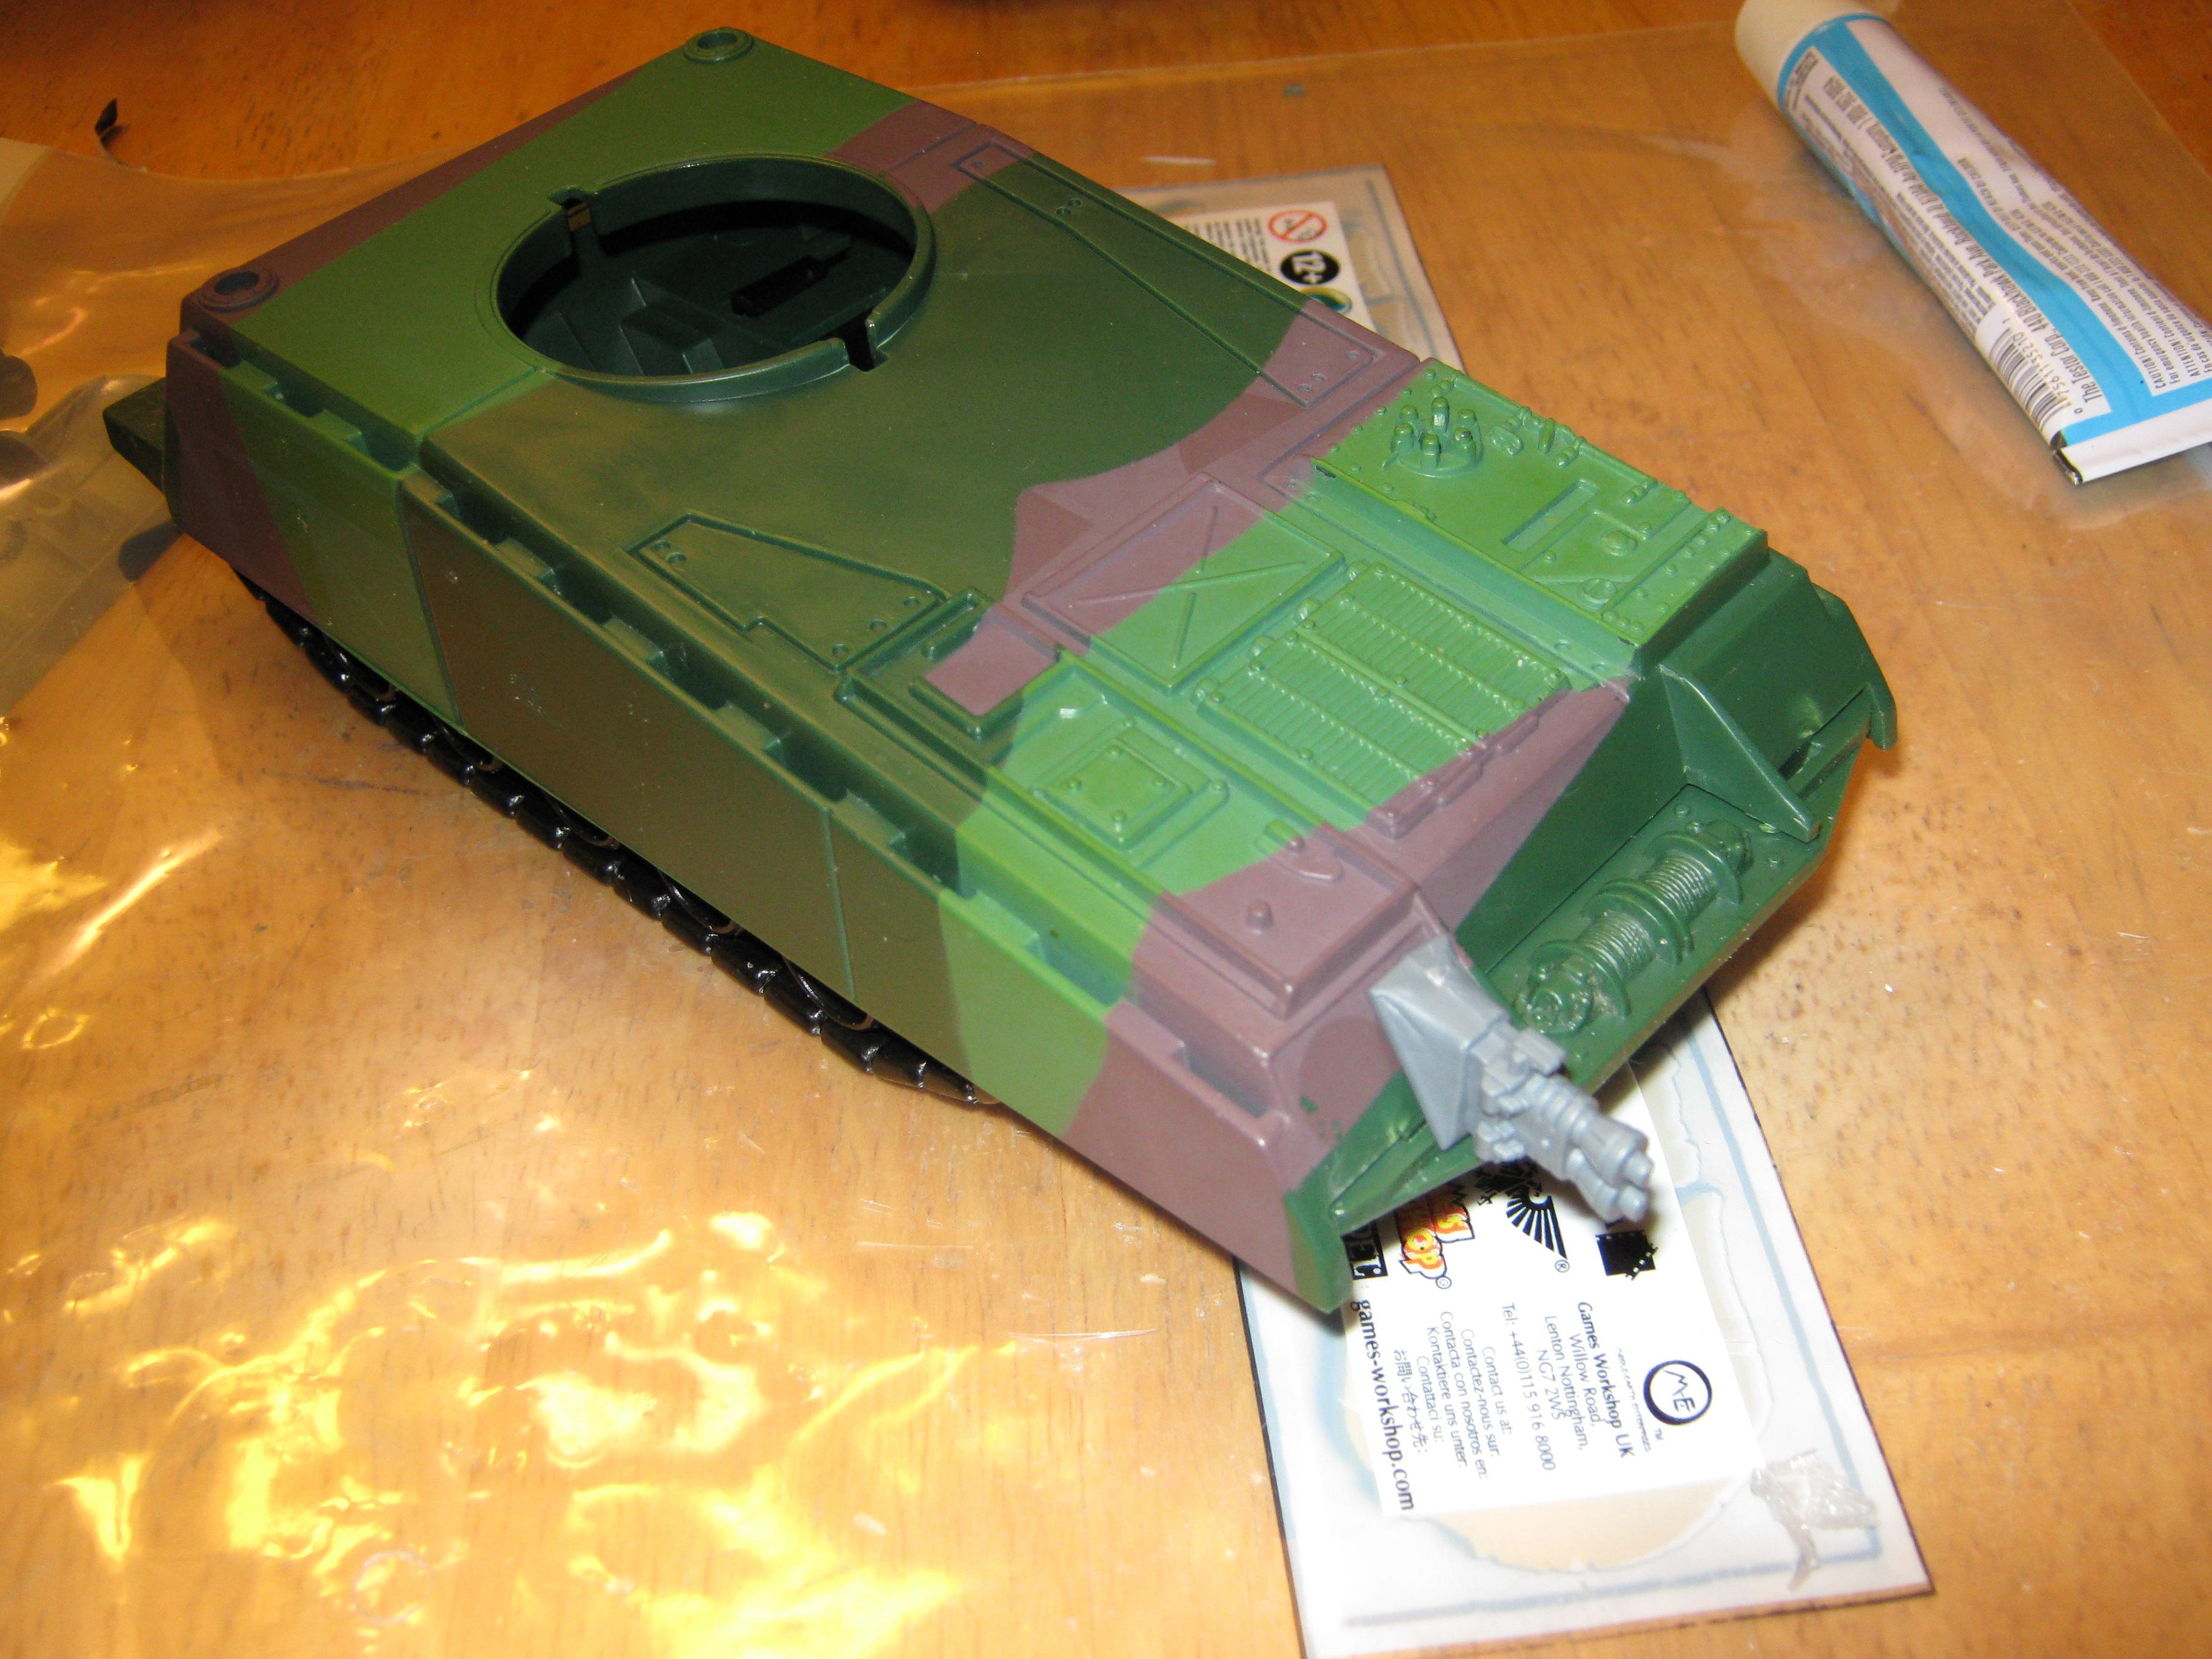 Anti-aircraft, Armadillo, Conversion, G.i. Joe, Tank, Toy